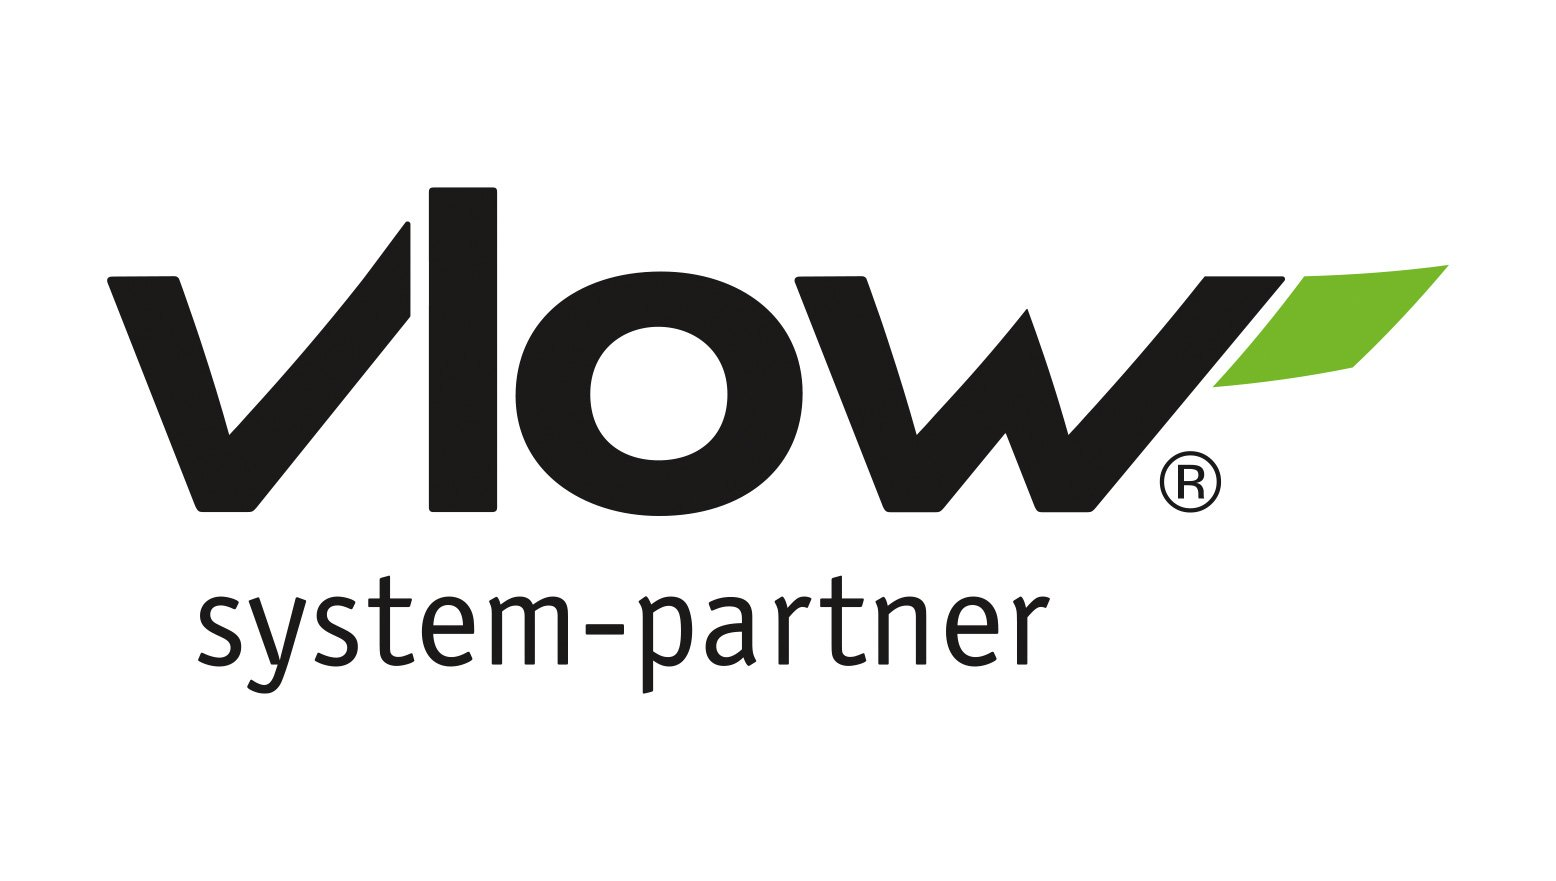 vlow system partner